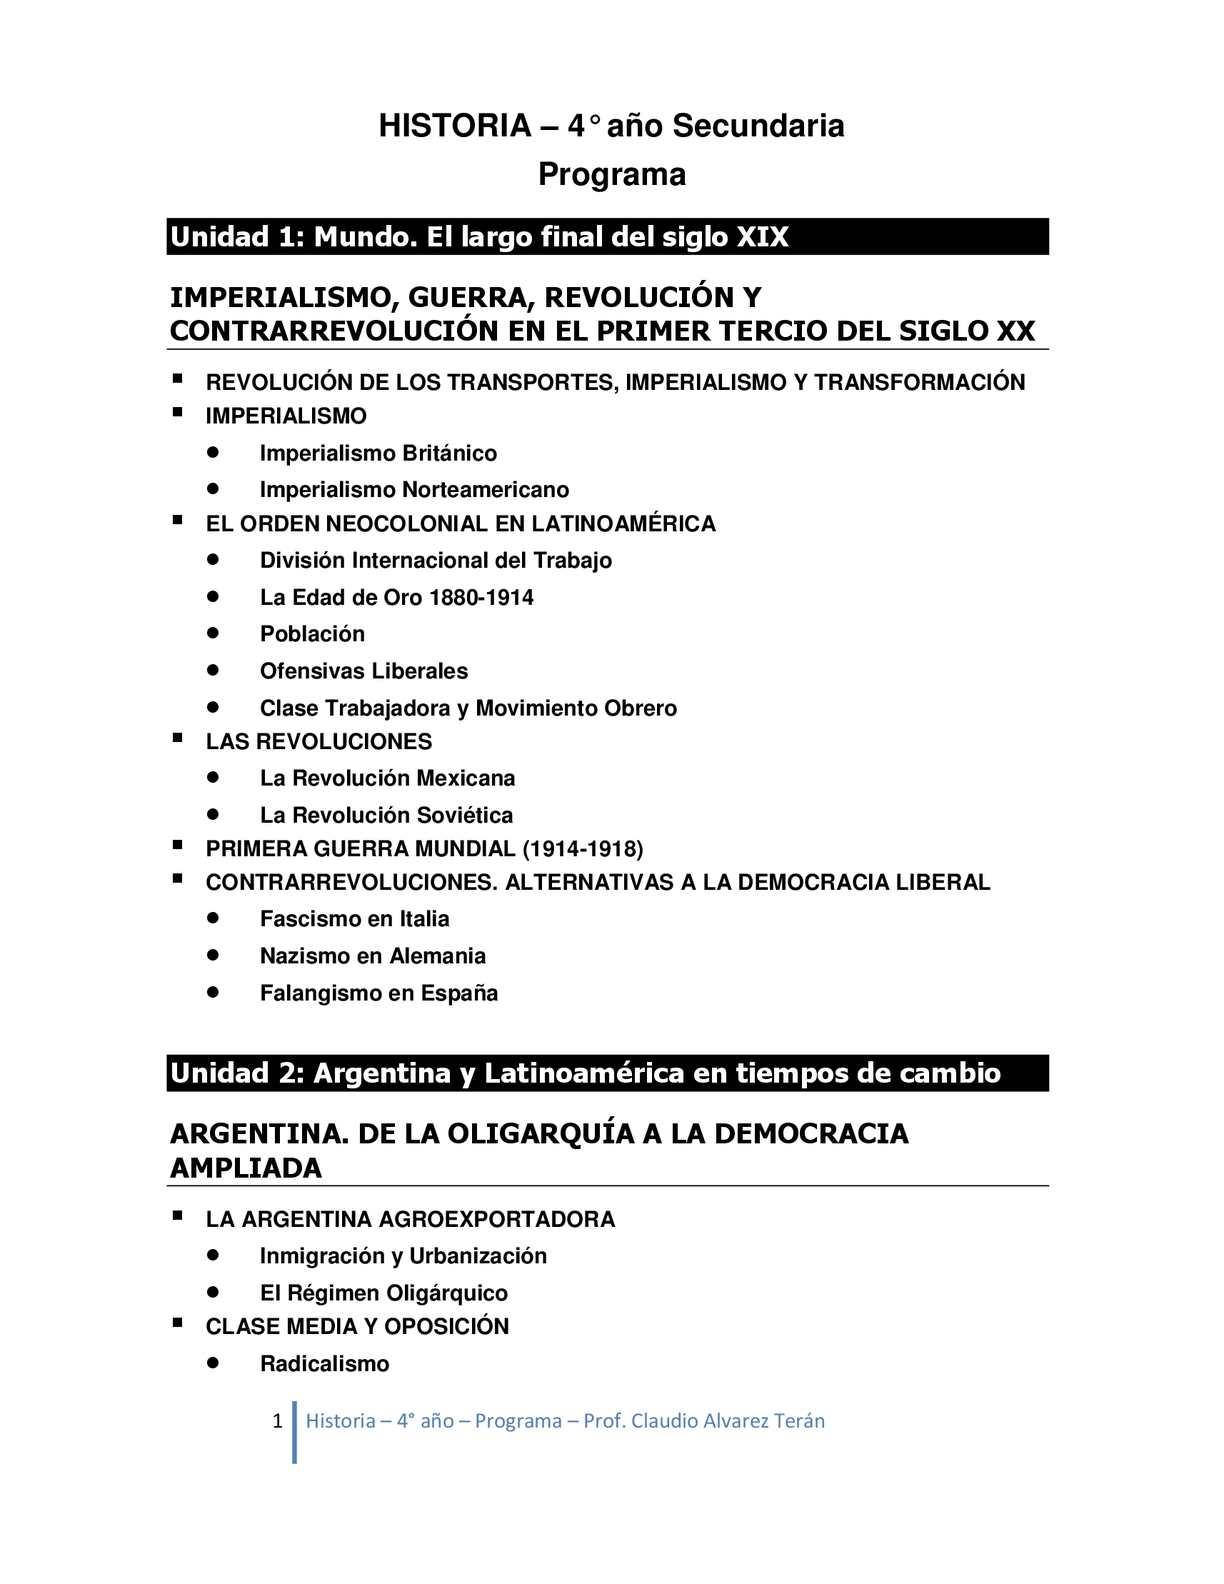 Programa de Historia 4° año secundaria